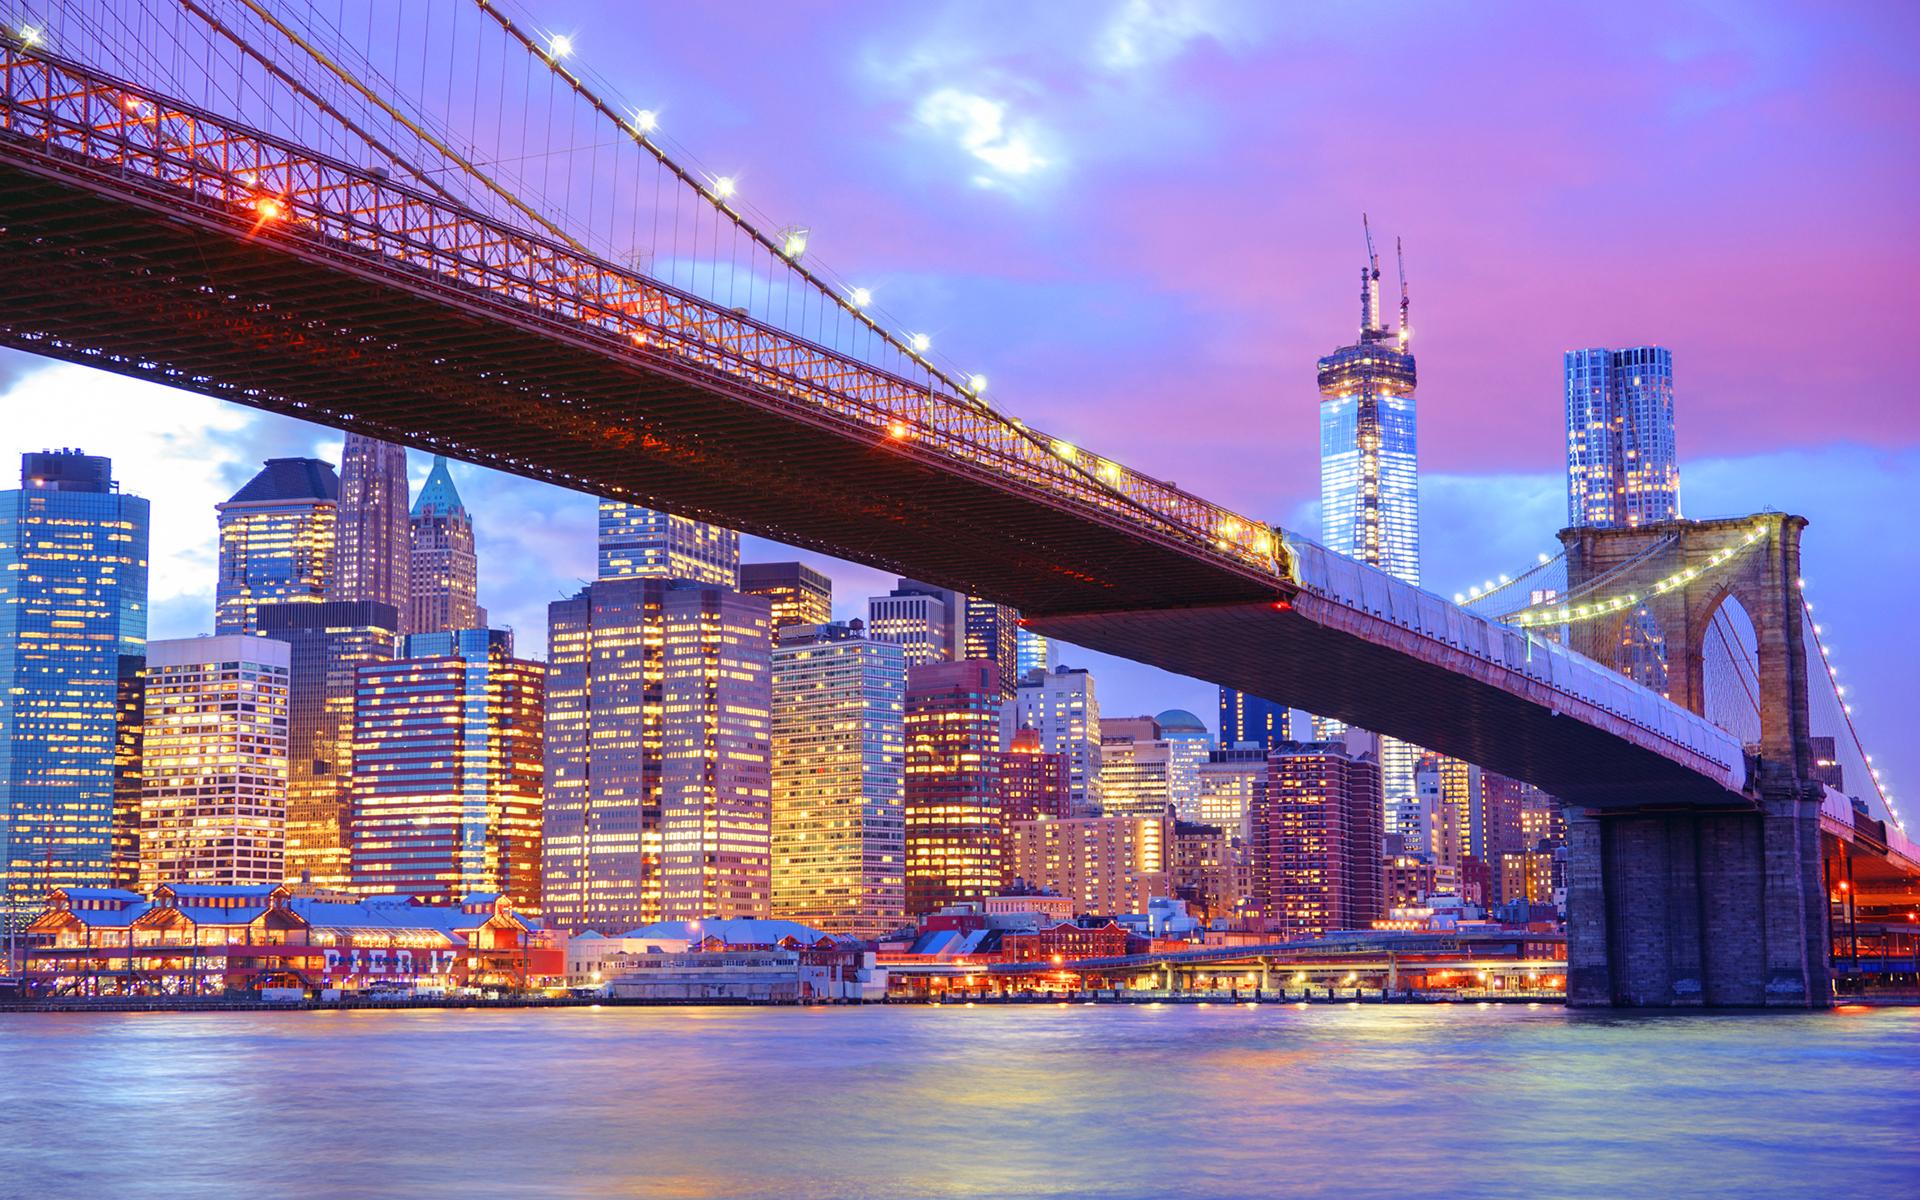 Brooklyn bridge city lights